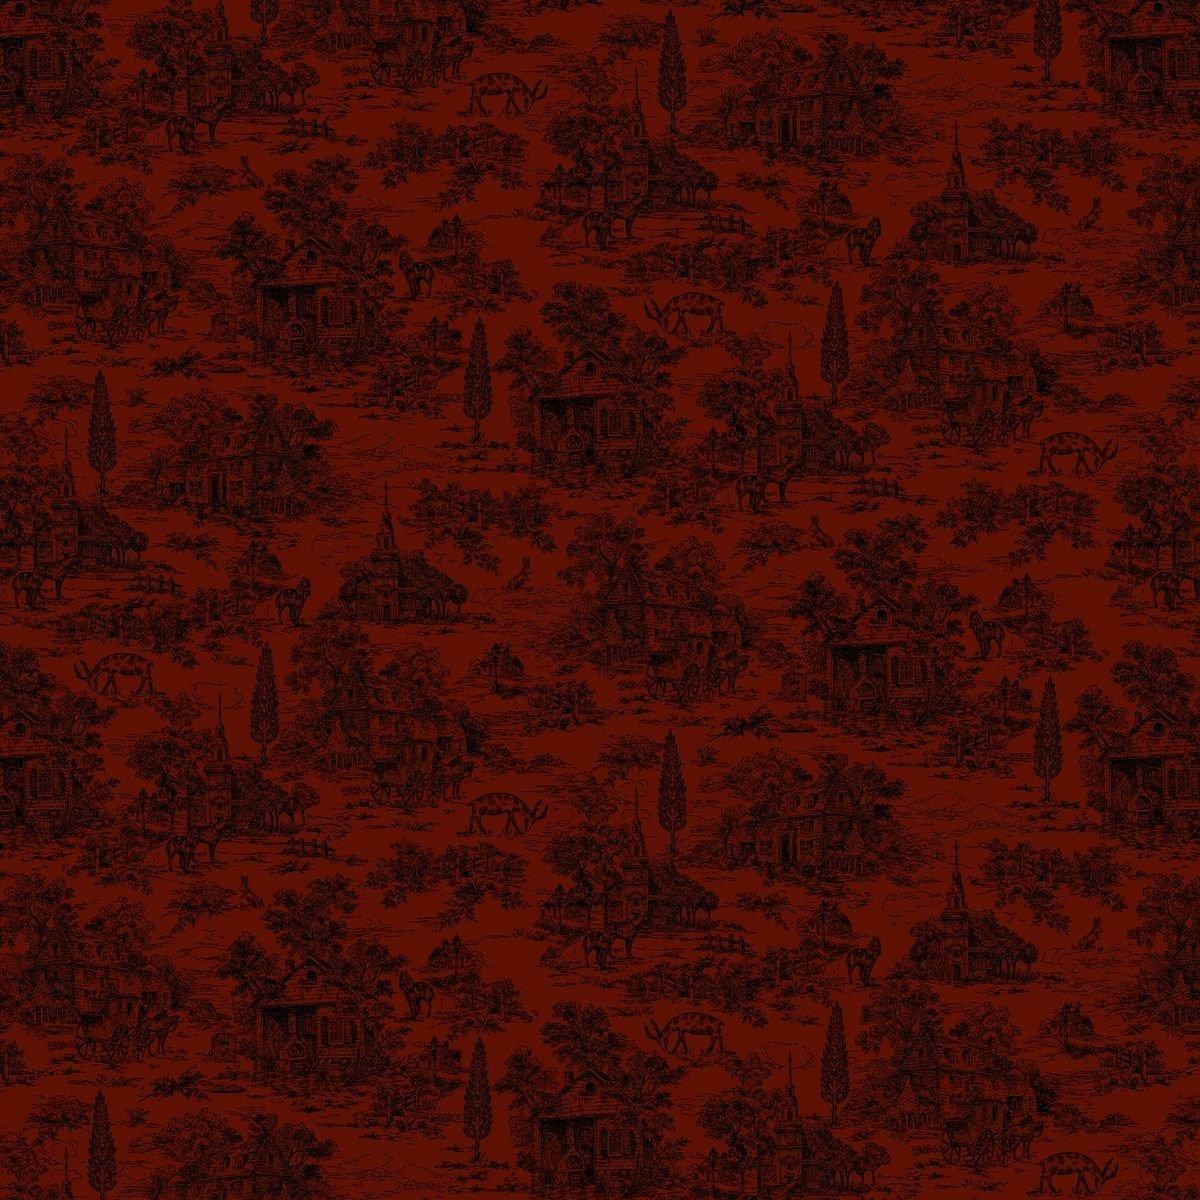 HG-Farmhouse Christmas 9668-88 Red - Toile